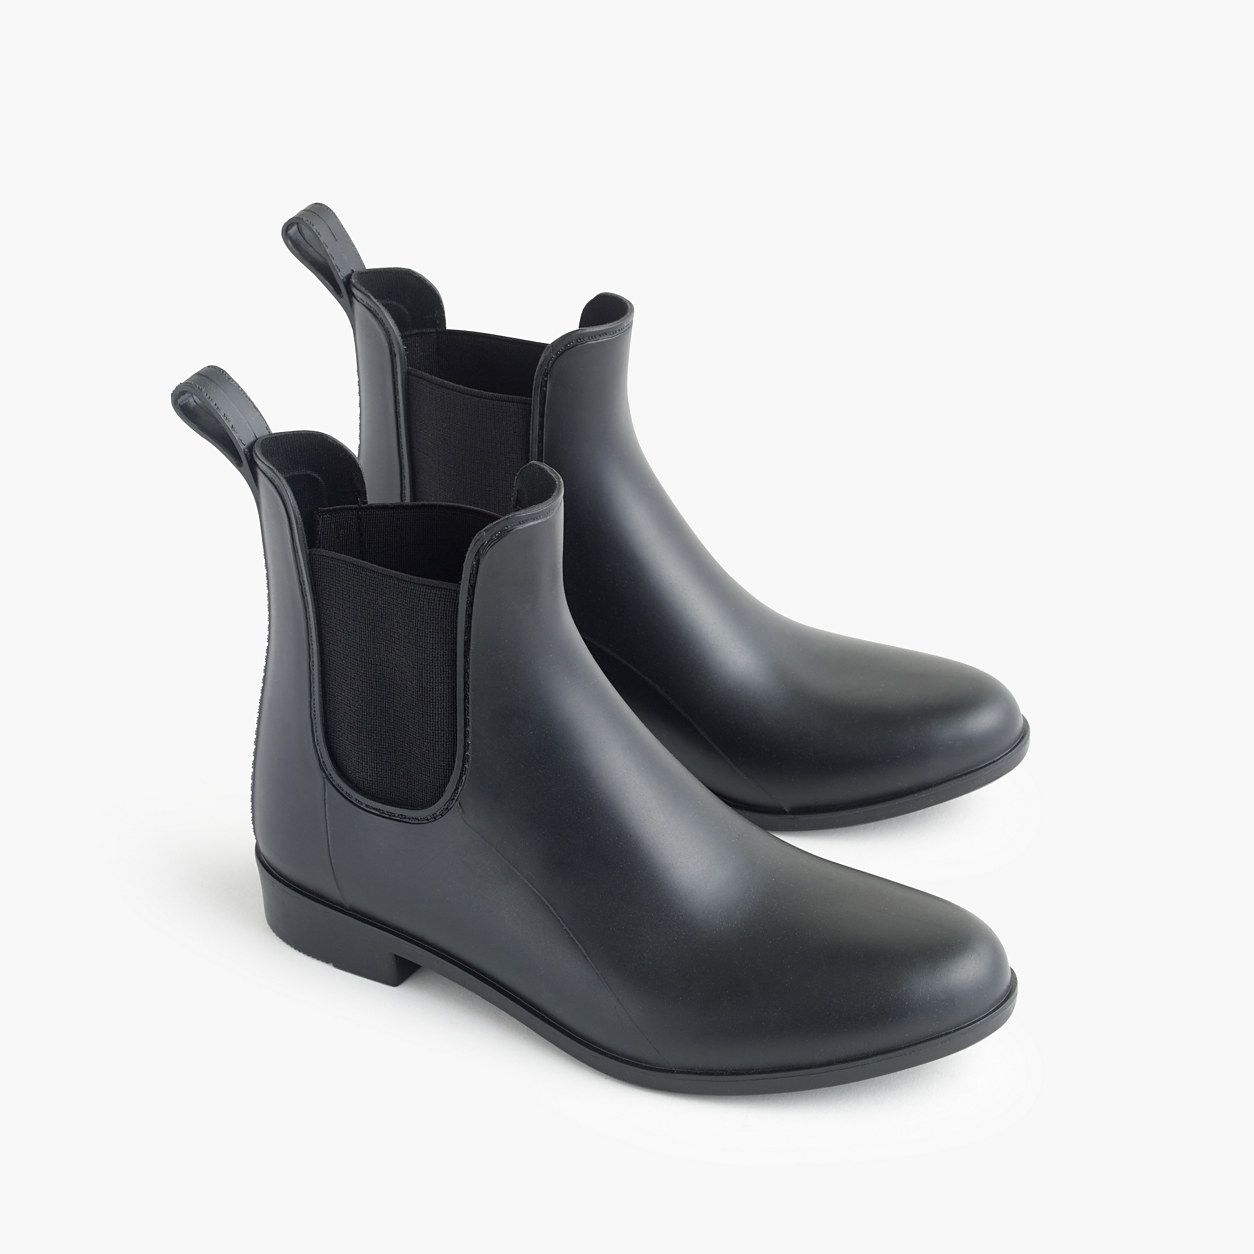 6f86bdfe337b1 Matte Chelsea rain boots : size 5 | J.Crew | Shoes | Chelsea rain ...